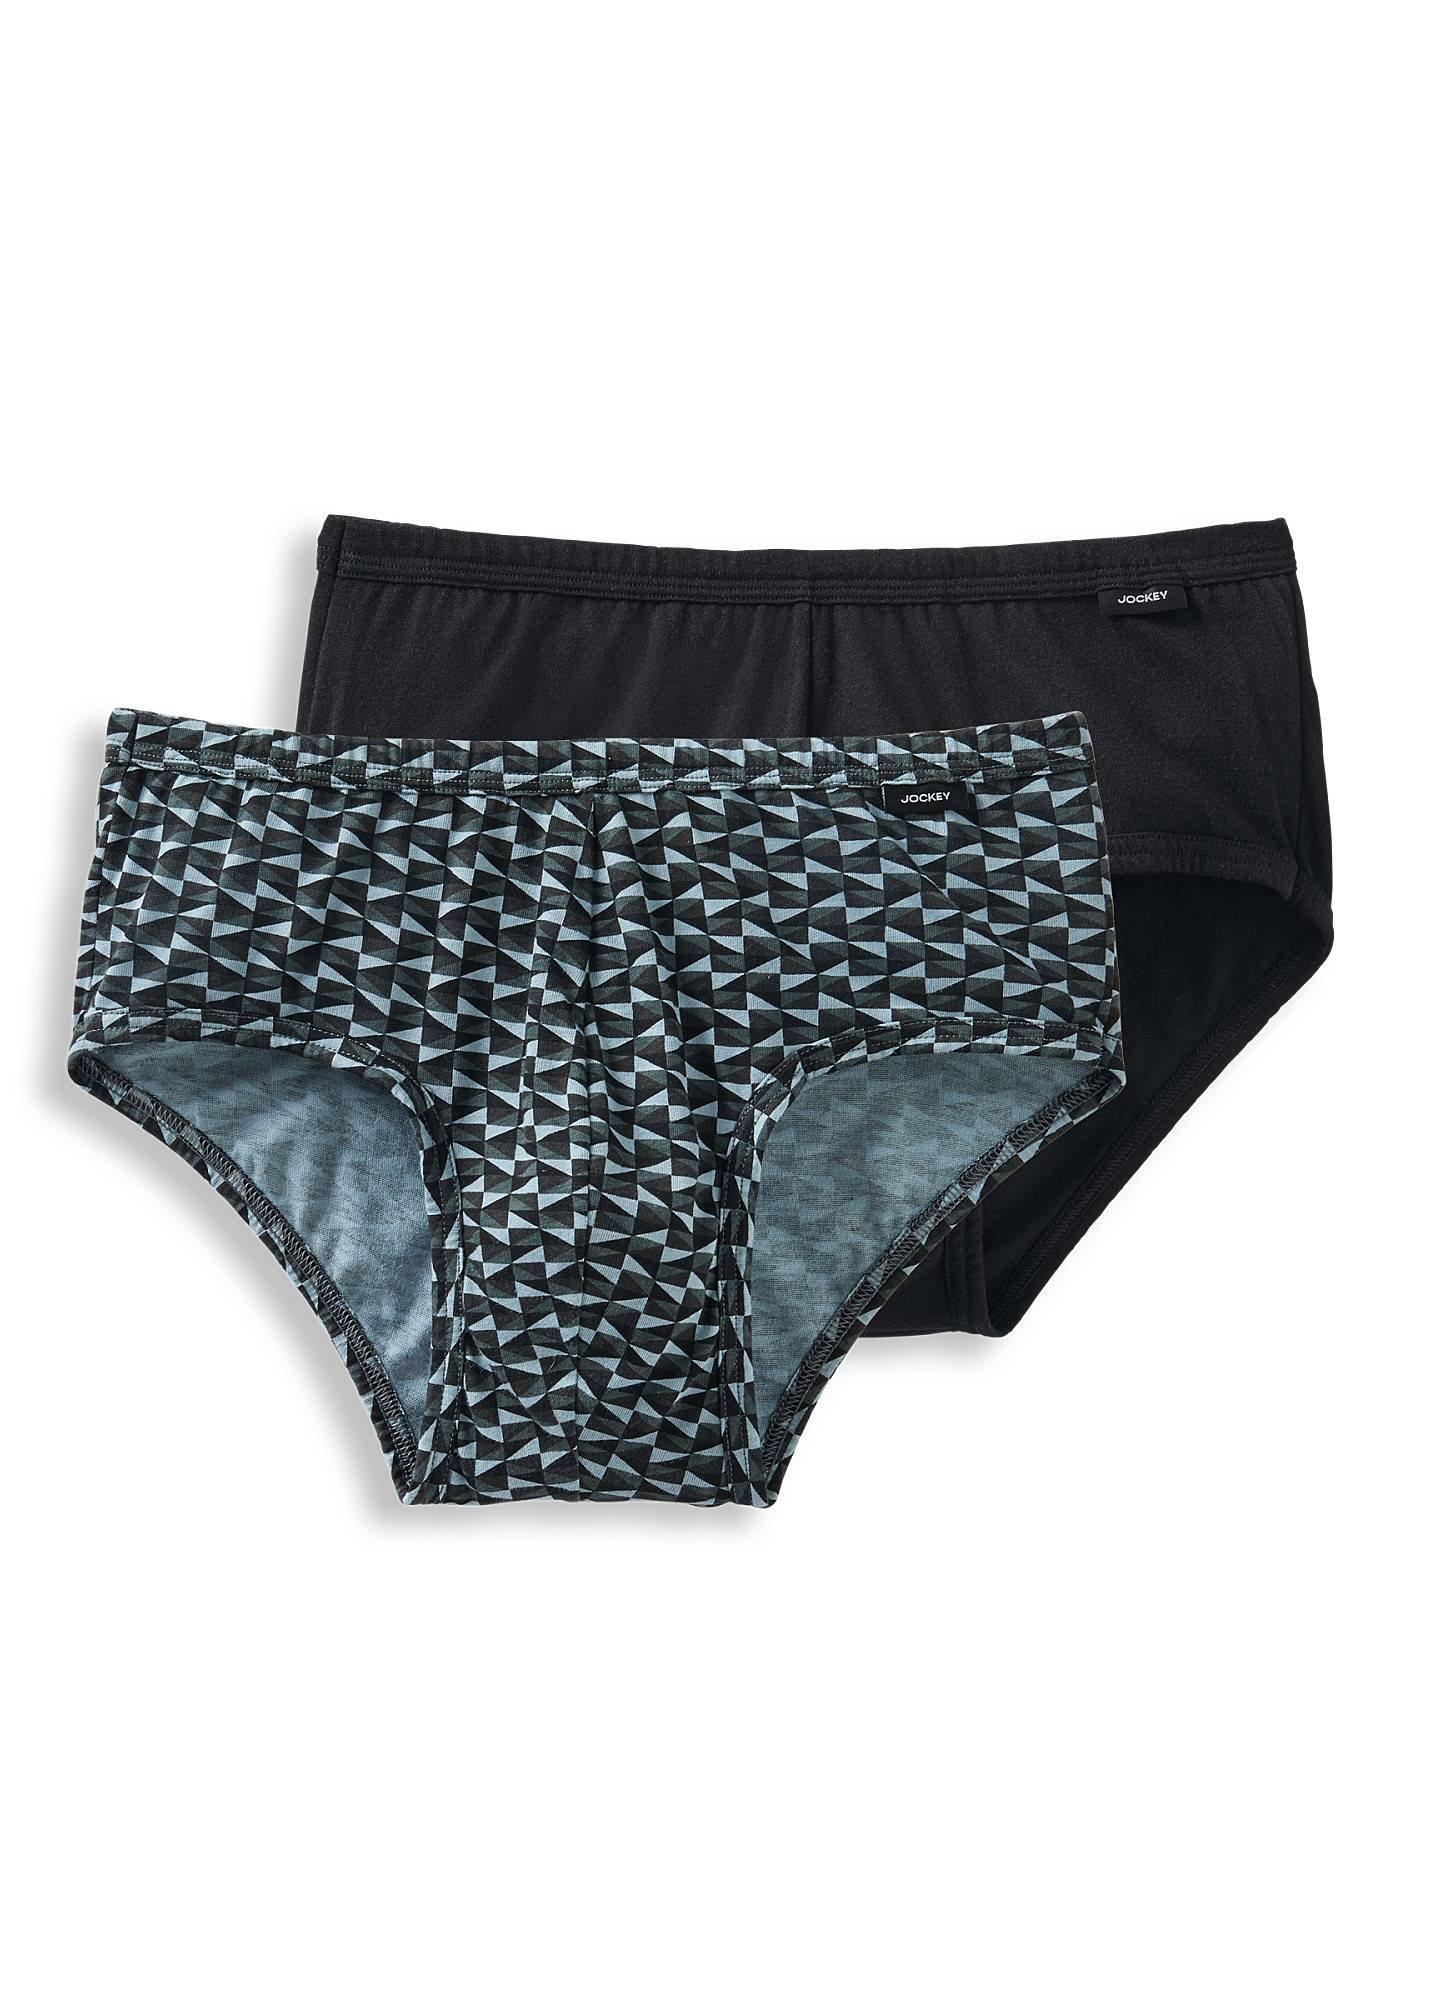 Jockey Men's Underwear Elance Poco Brief - 2 Pack, Sail Away Geo Grey/Black, L